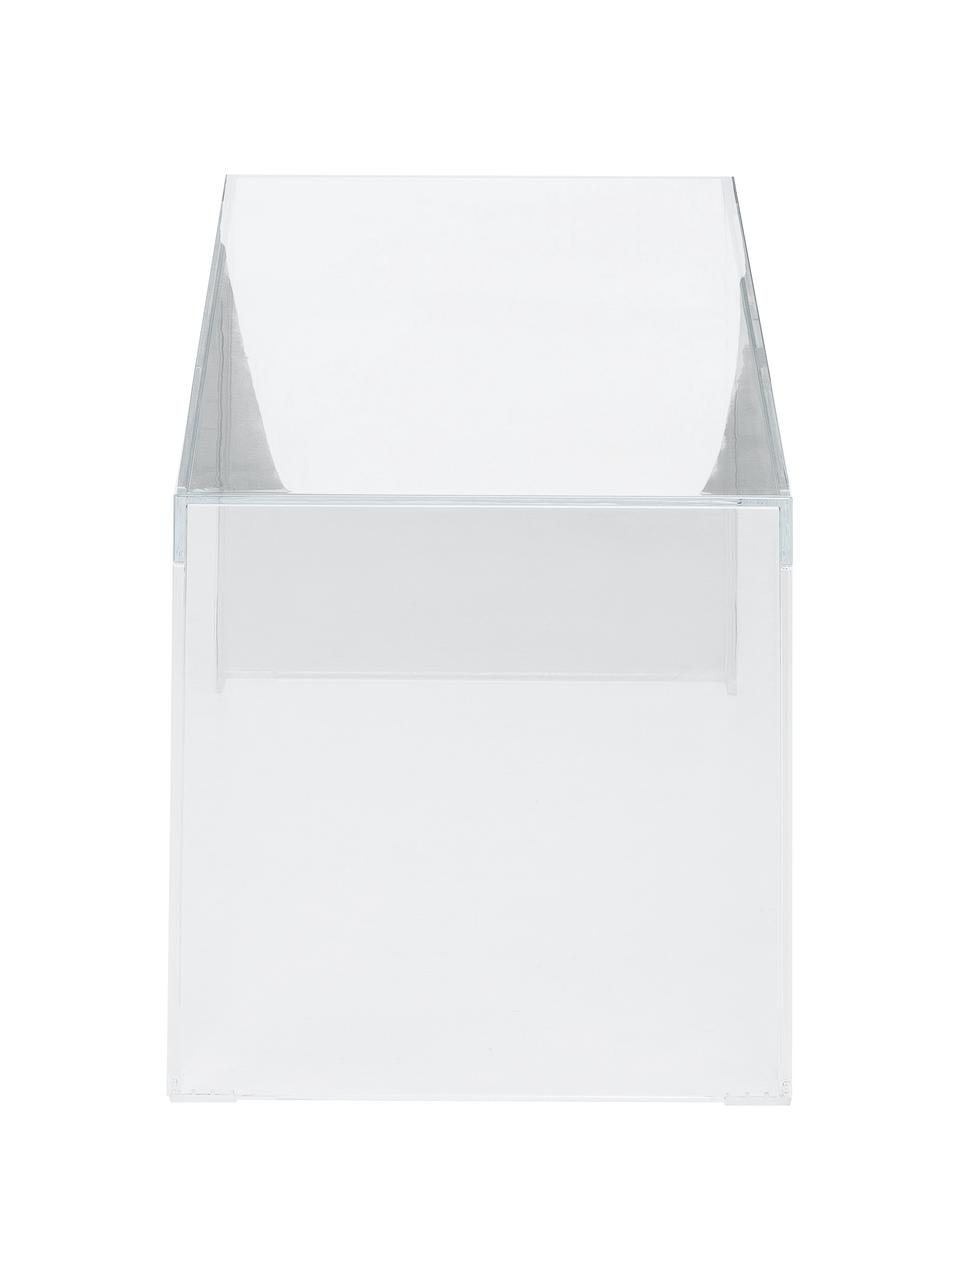 Transparenter Couchtisch Invisible, Kunststoff, Transparent, 120 x 40 cm